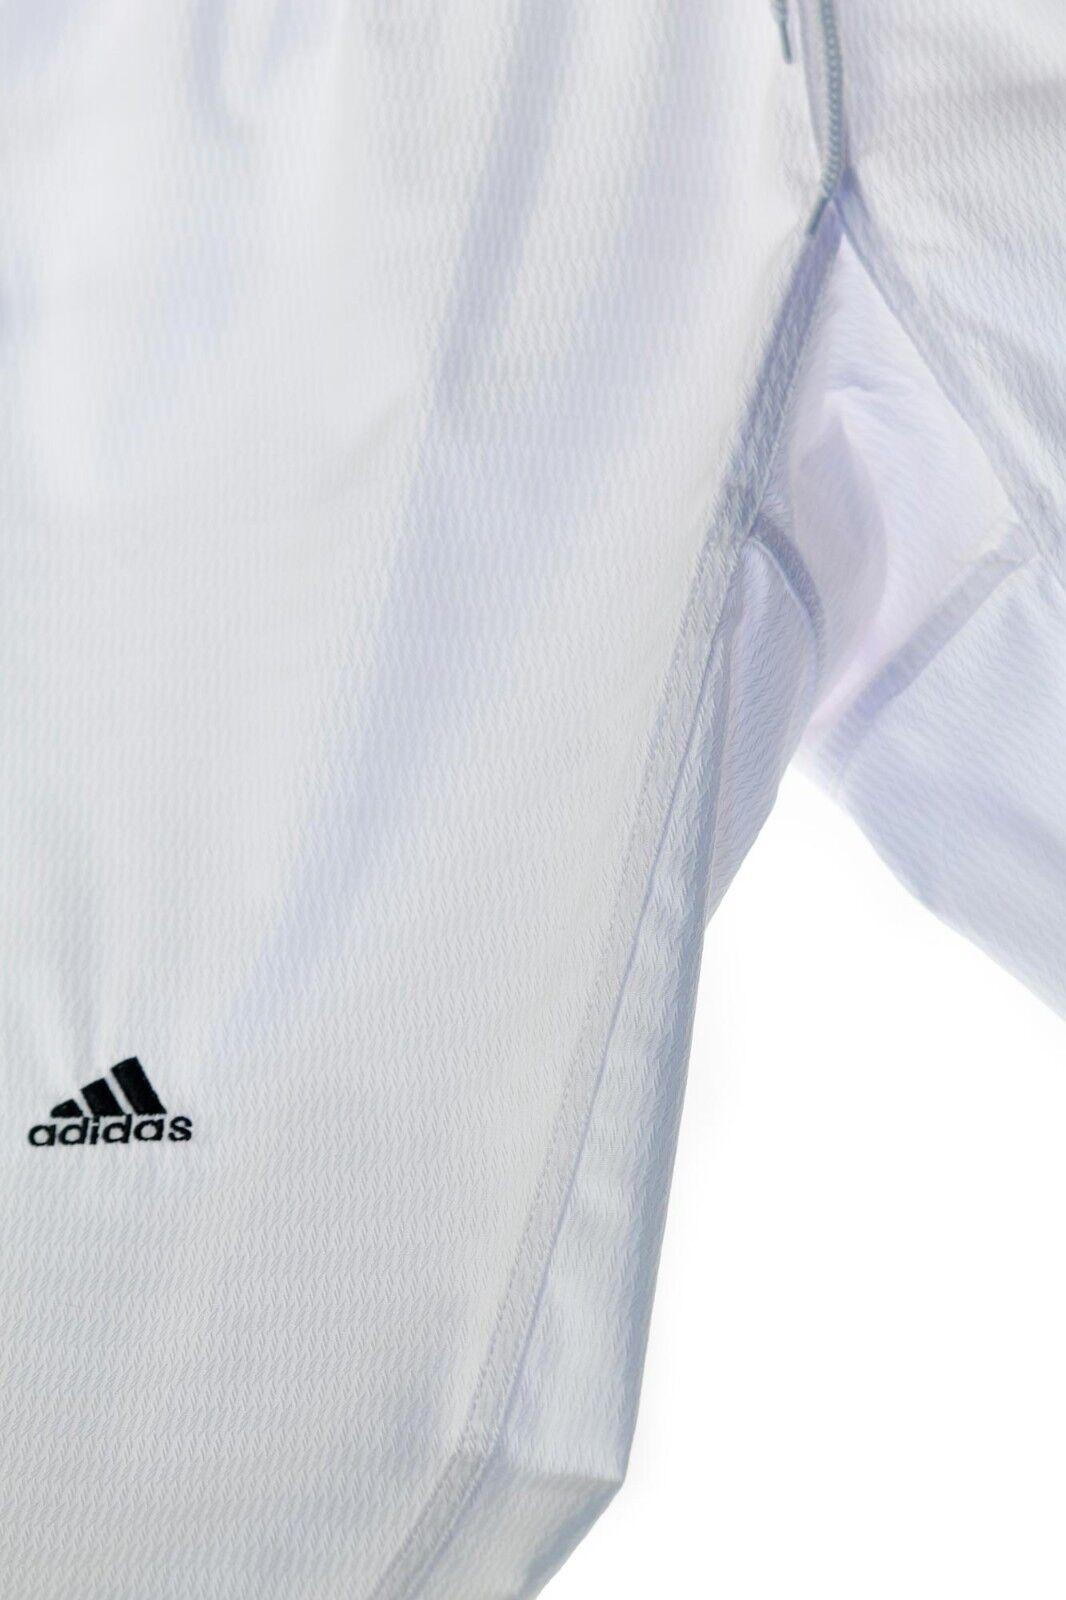 Adidas Taekwondoanzug, Adichamp III - schwarzes Revers - - - Taekwondo Anzug - Dobok afc9aa